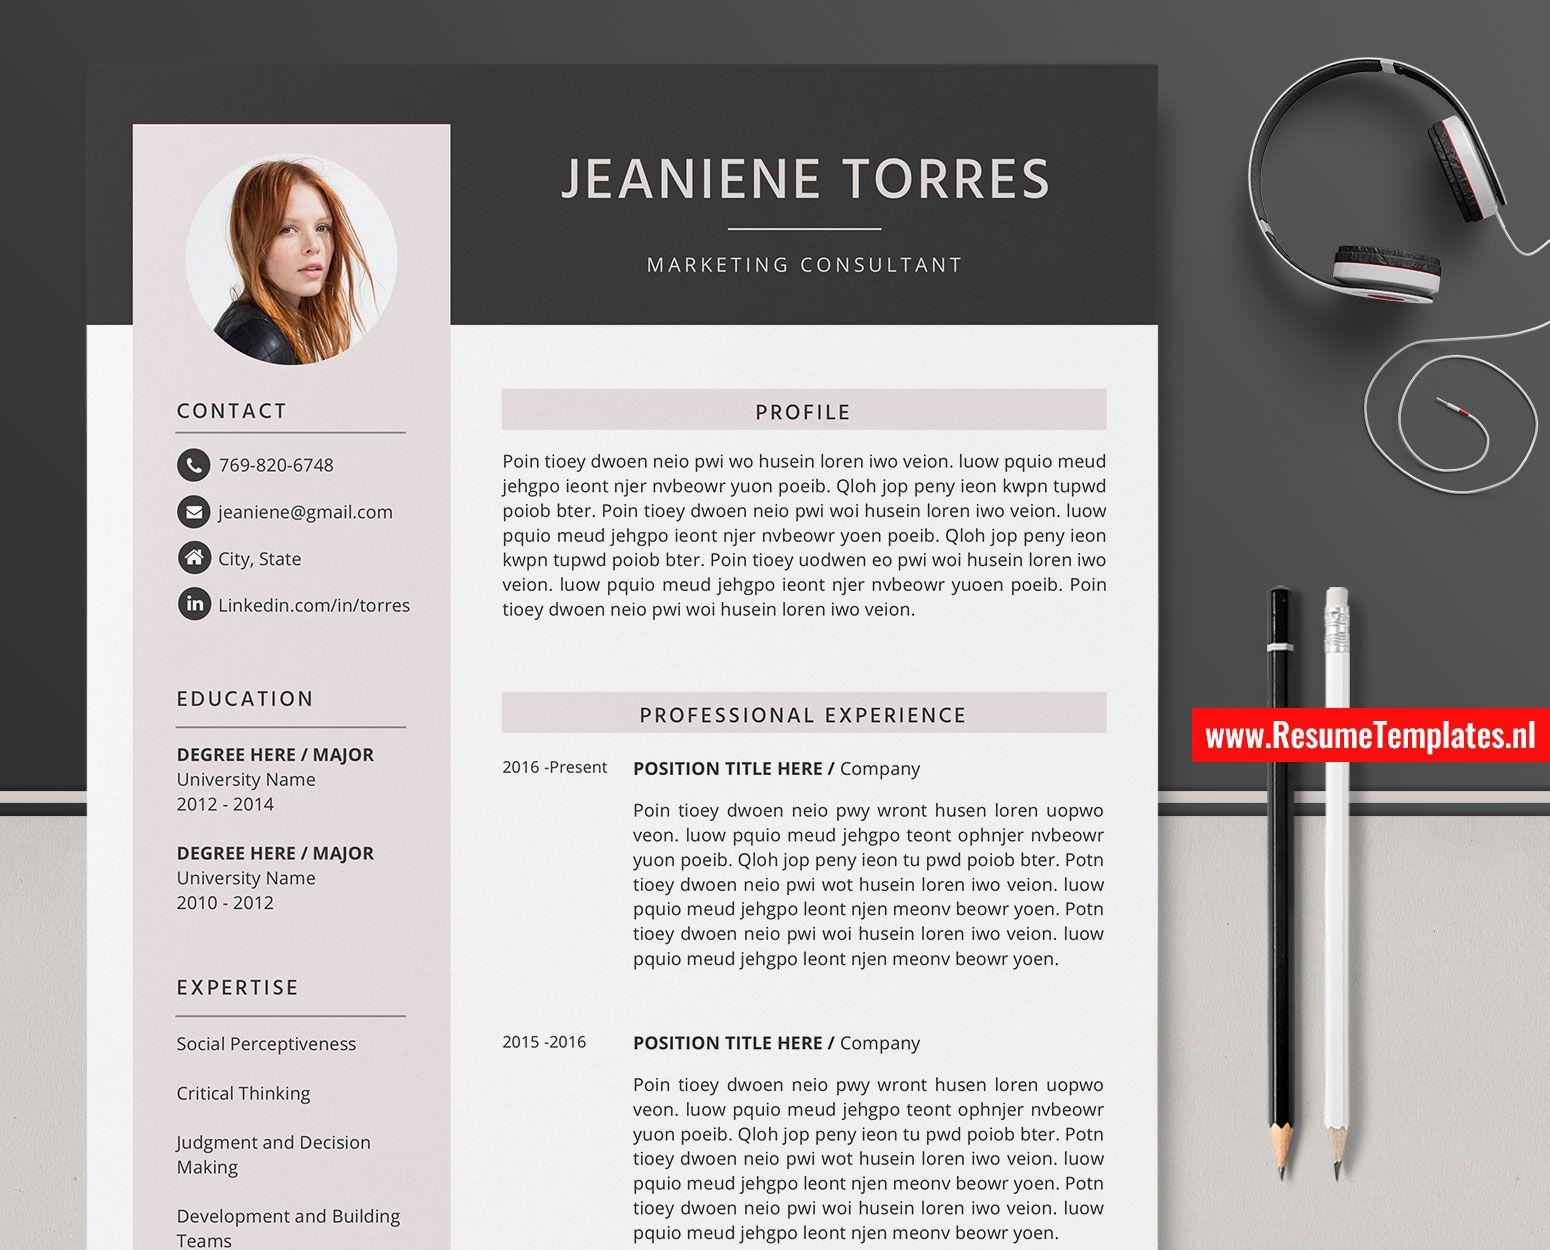 ResumeTemplates.nl Professional and Creative Resume